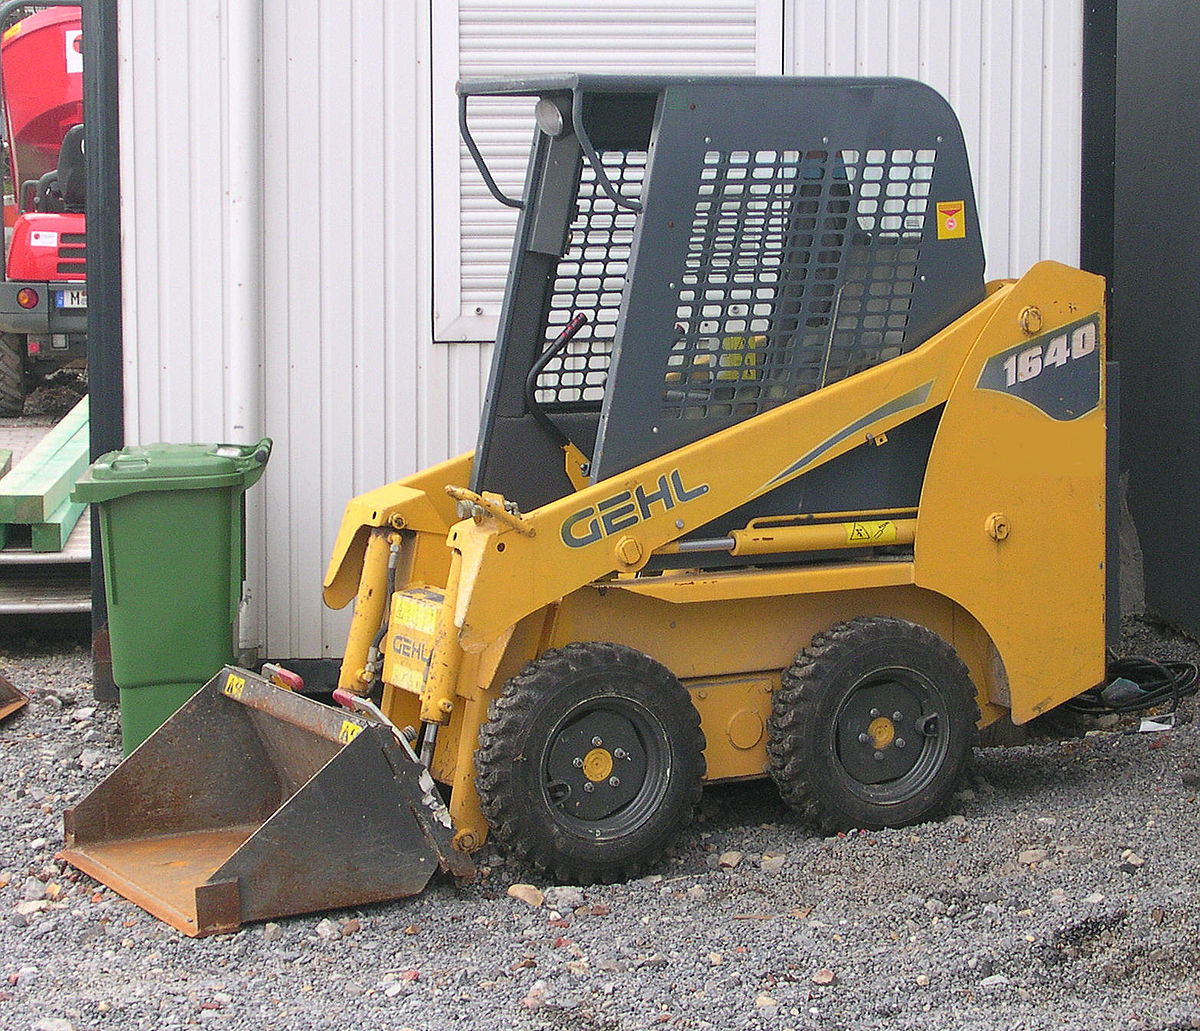 Skid-steer loader - Wikipedia